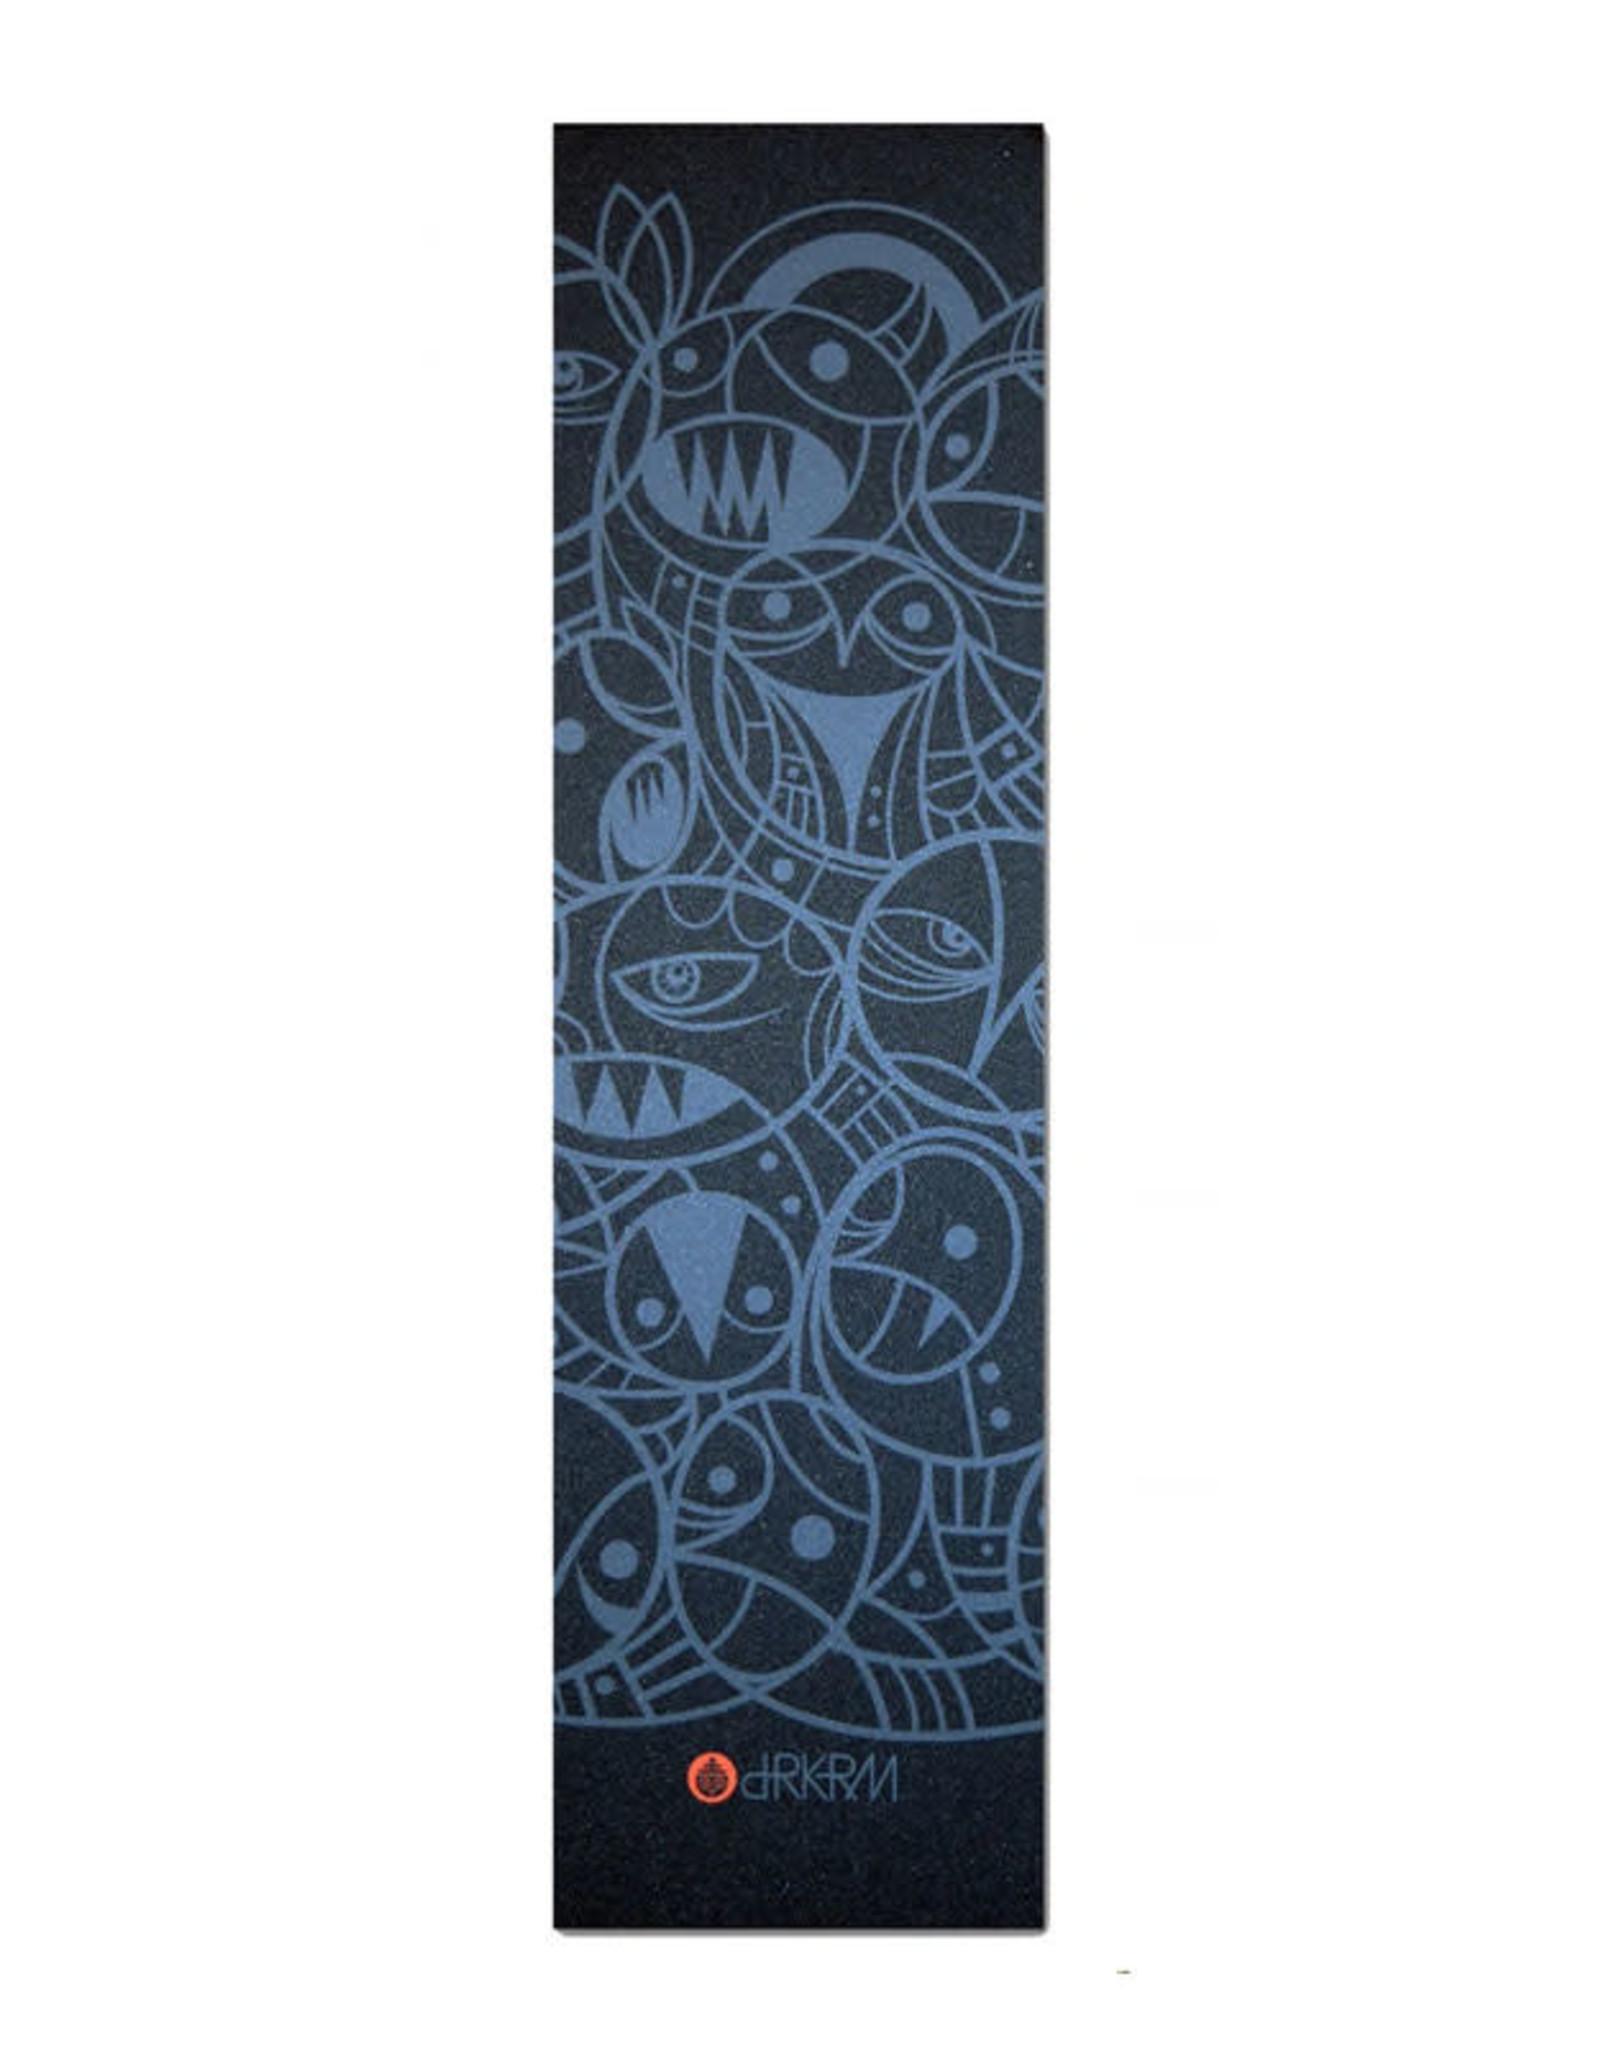 Darkroom Grip Sheet - Chaos Tonal